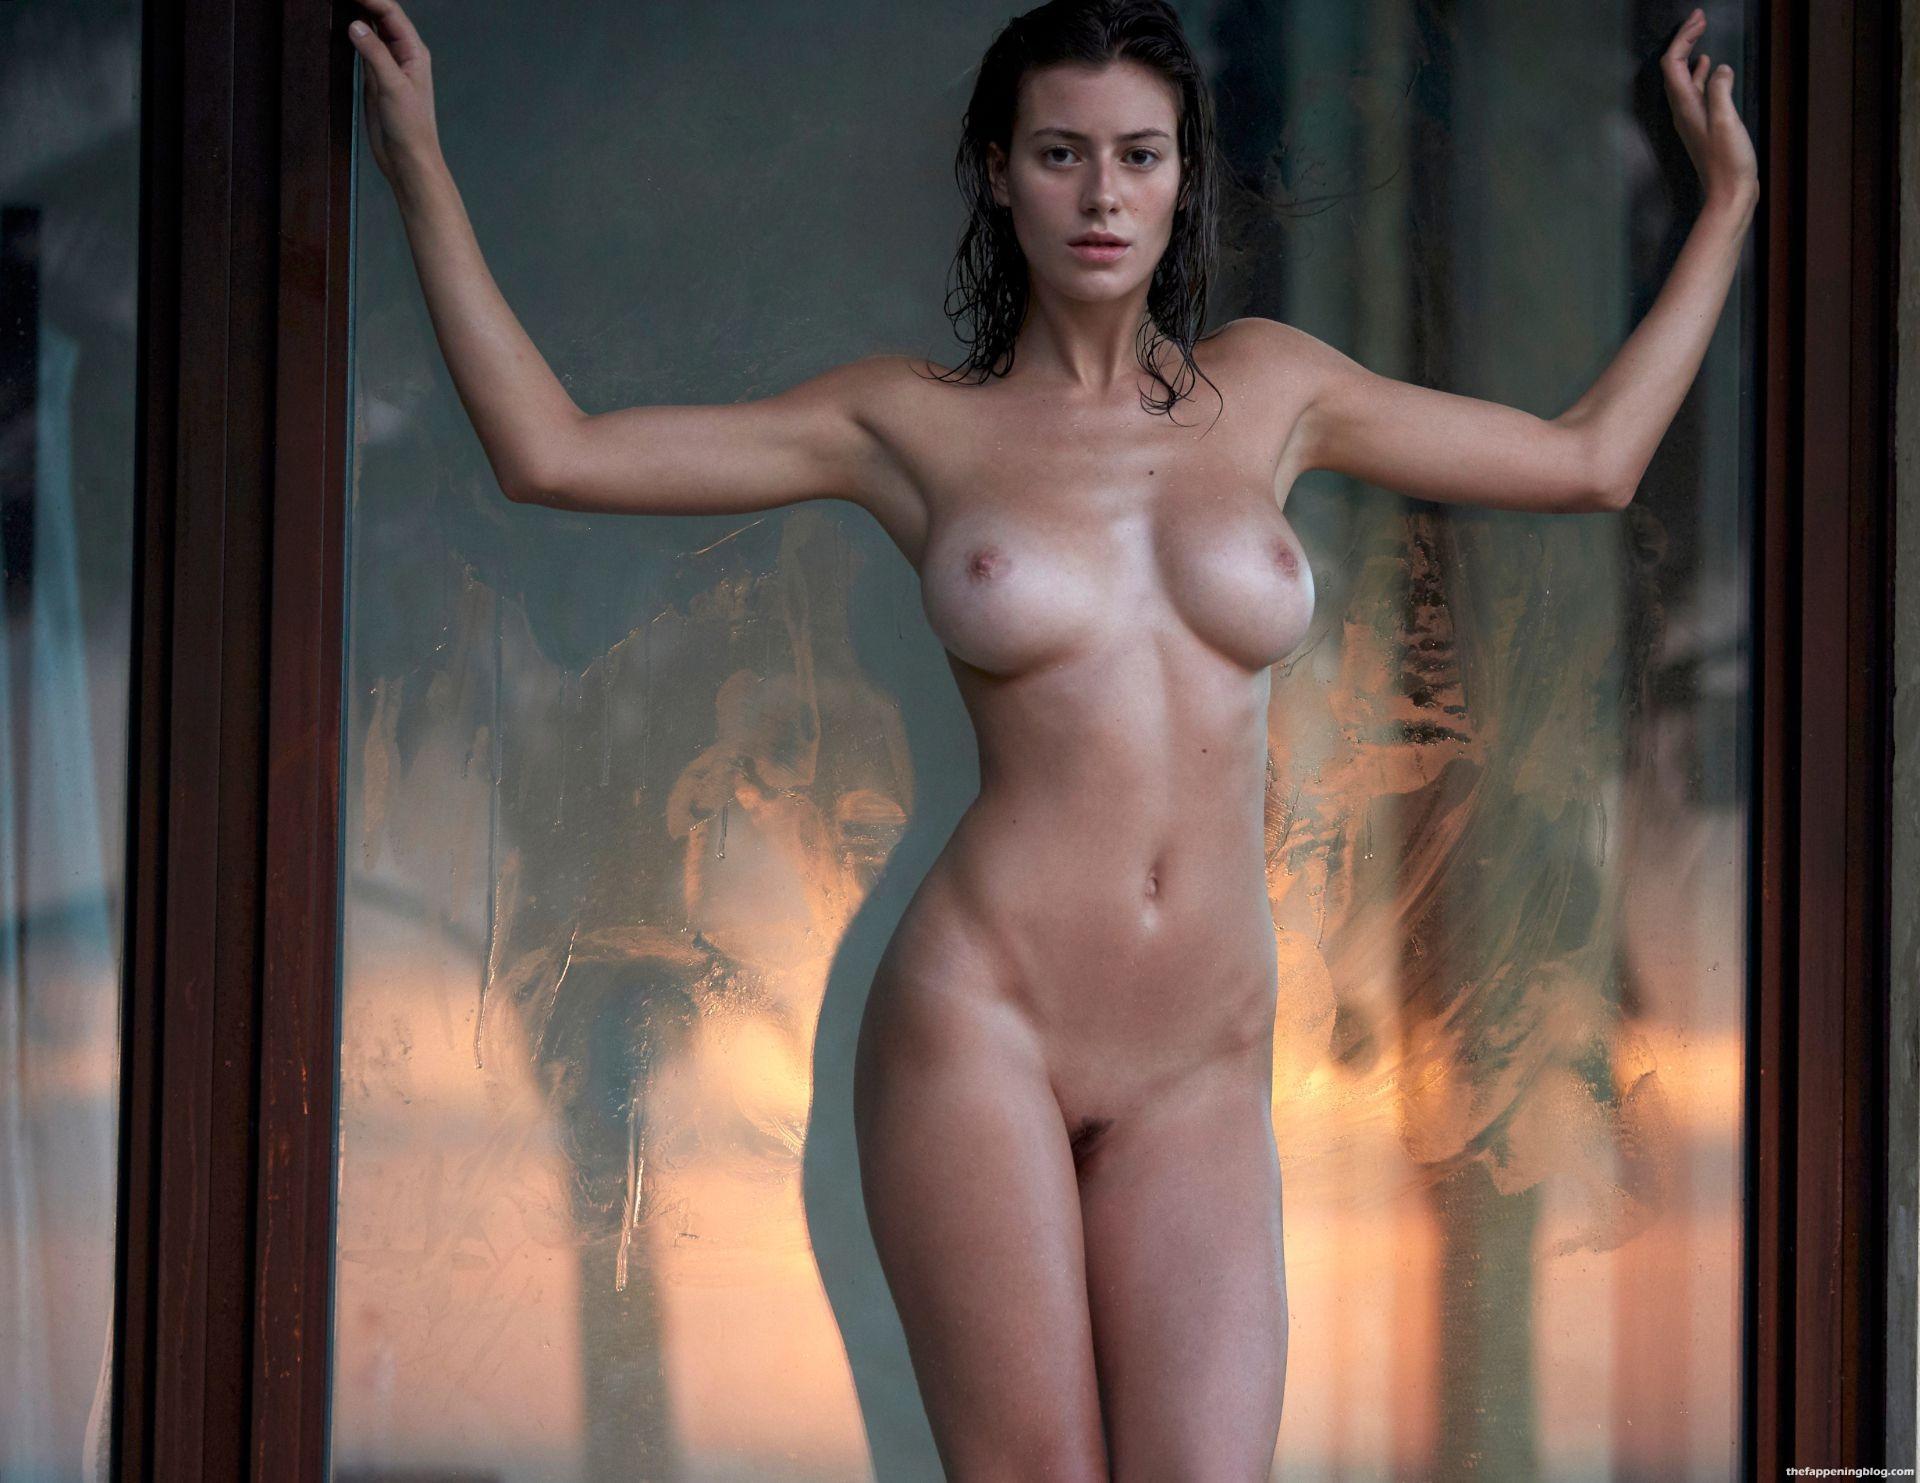 Alejandra-Guilmant-Naked-Tits-22-11-thefappeningblog.com_.jpg